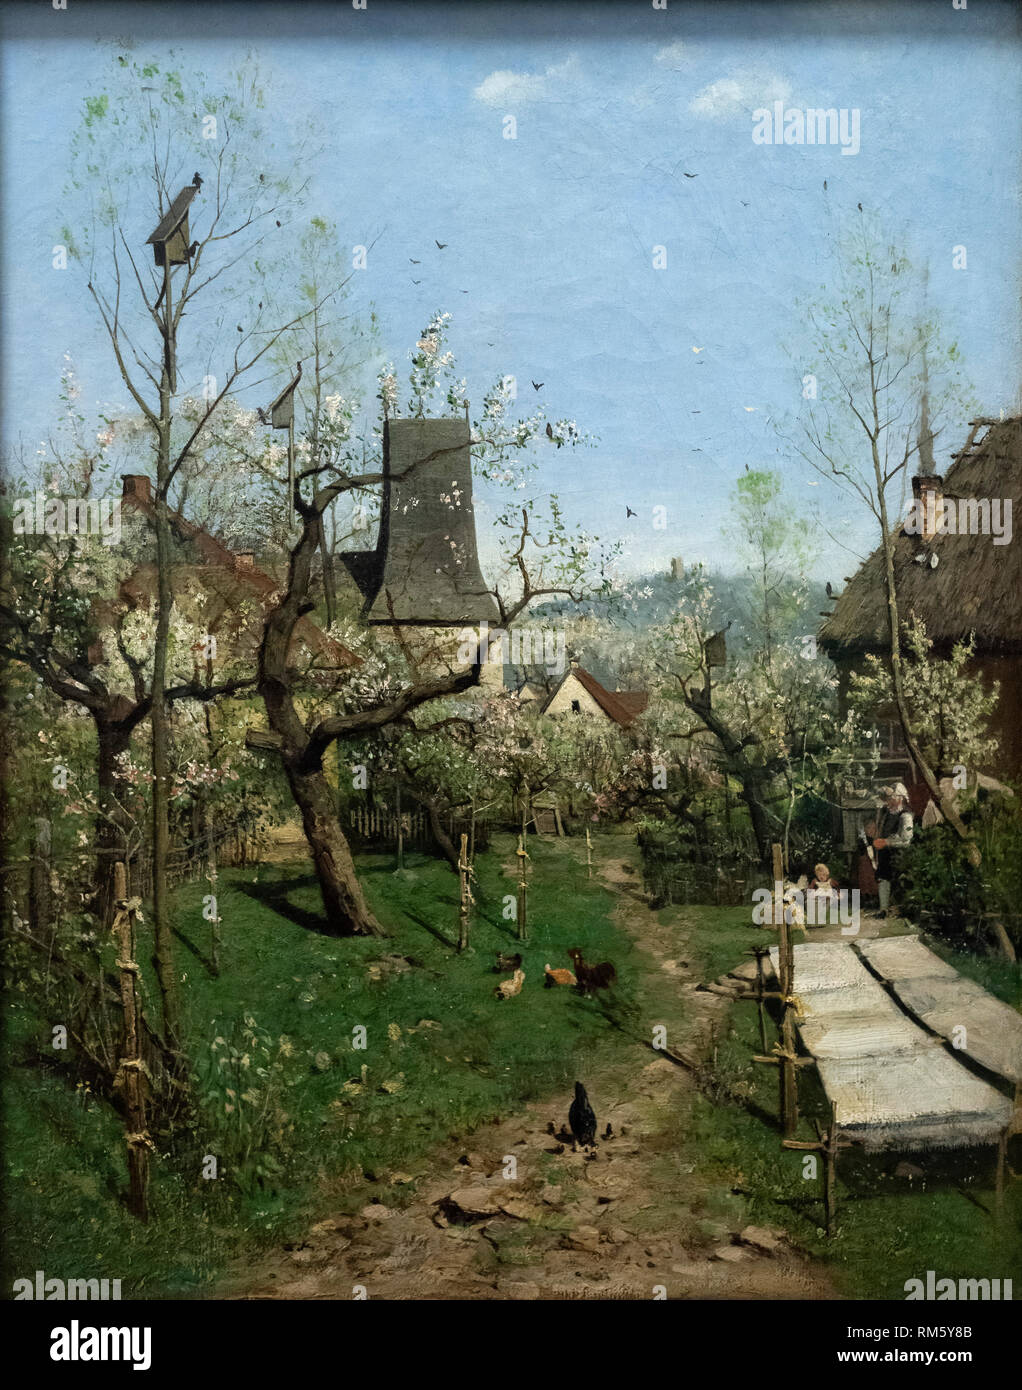 Karl Buchholz (1849-1898), Spring in the Village, ca. 1872. Frühling auf dem Dorf. Alte Nationalgalerie, Berlin, Germany. - Stock Image